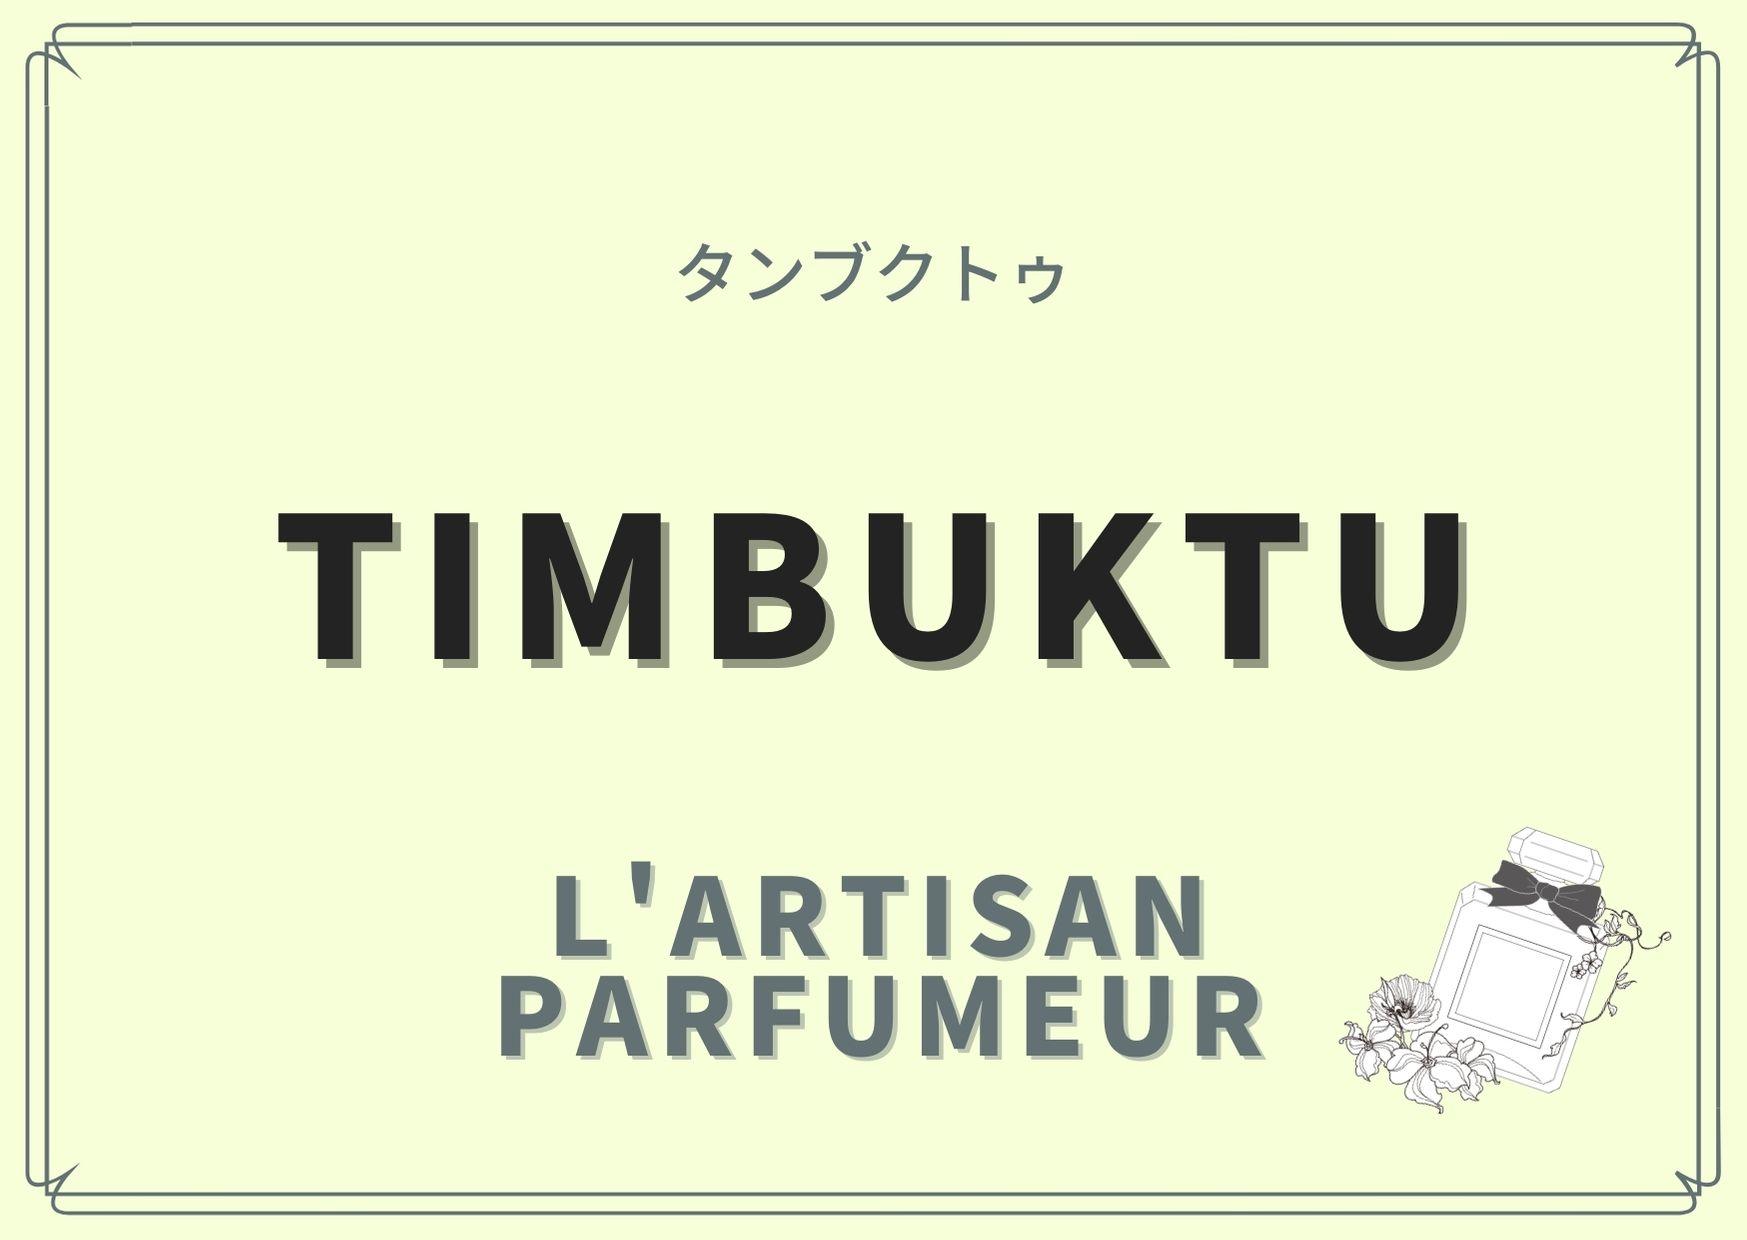 TIMBUKTU(タンブクトゥ)/L'ARTISAN PARFUMEUR(ラルチザン パフューム)